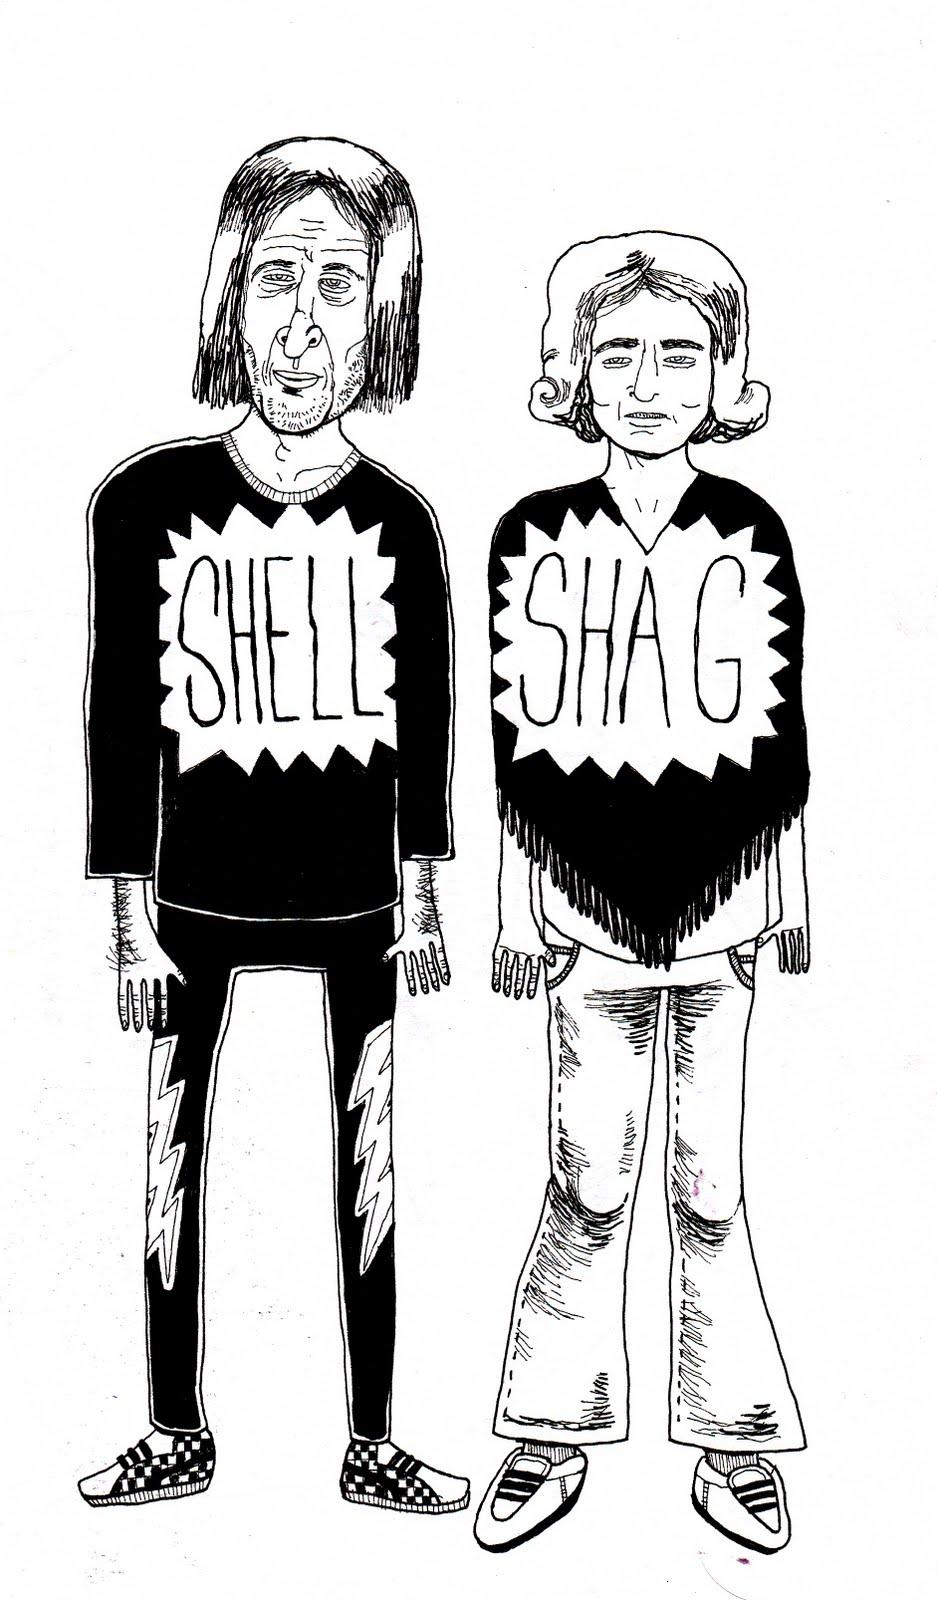 [shellshag]